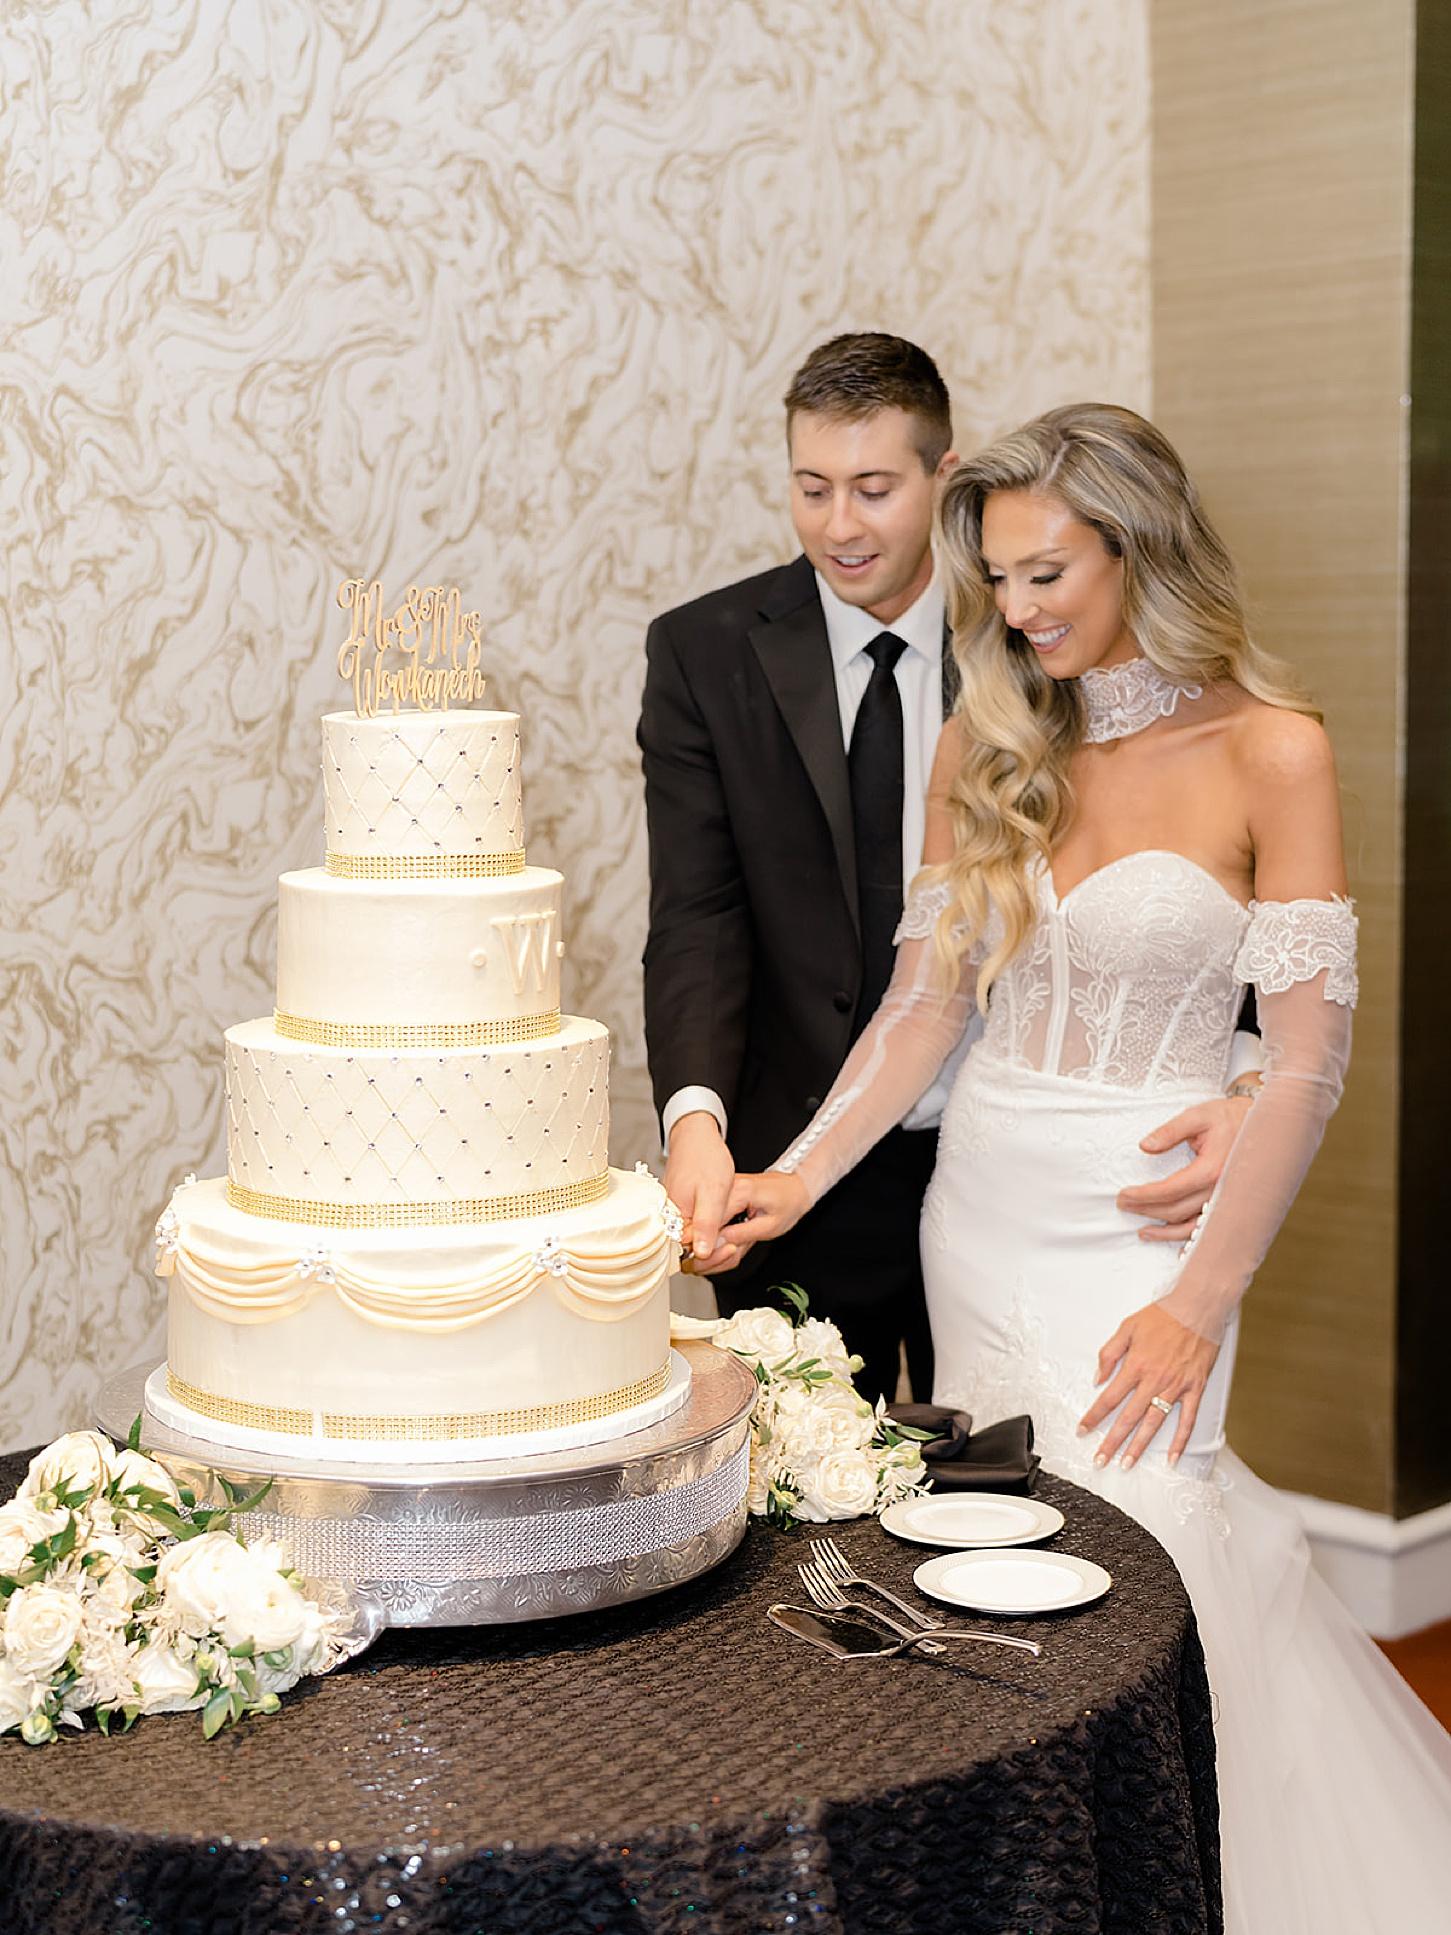 Atlantic City Wedding Photography Studio by Magdalena Studios Lexy Cha 0091